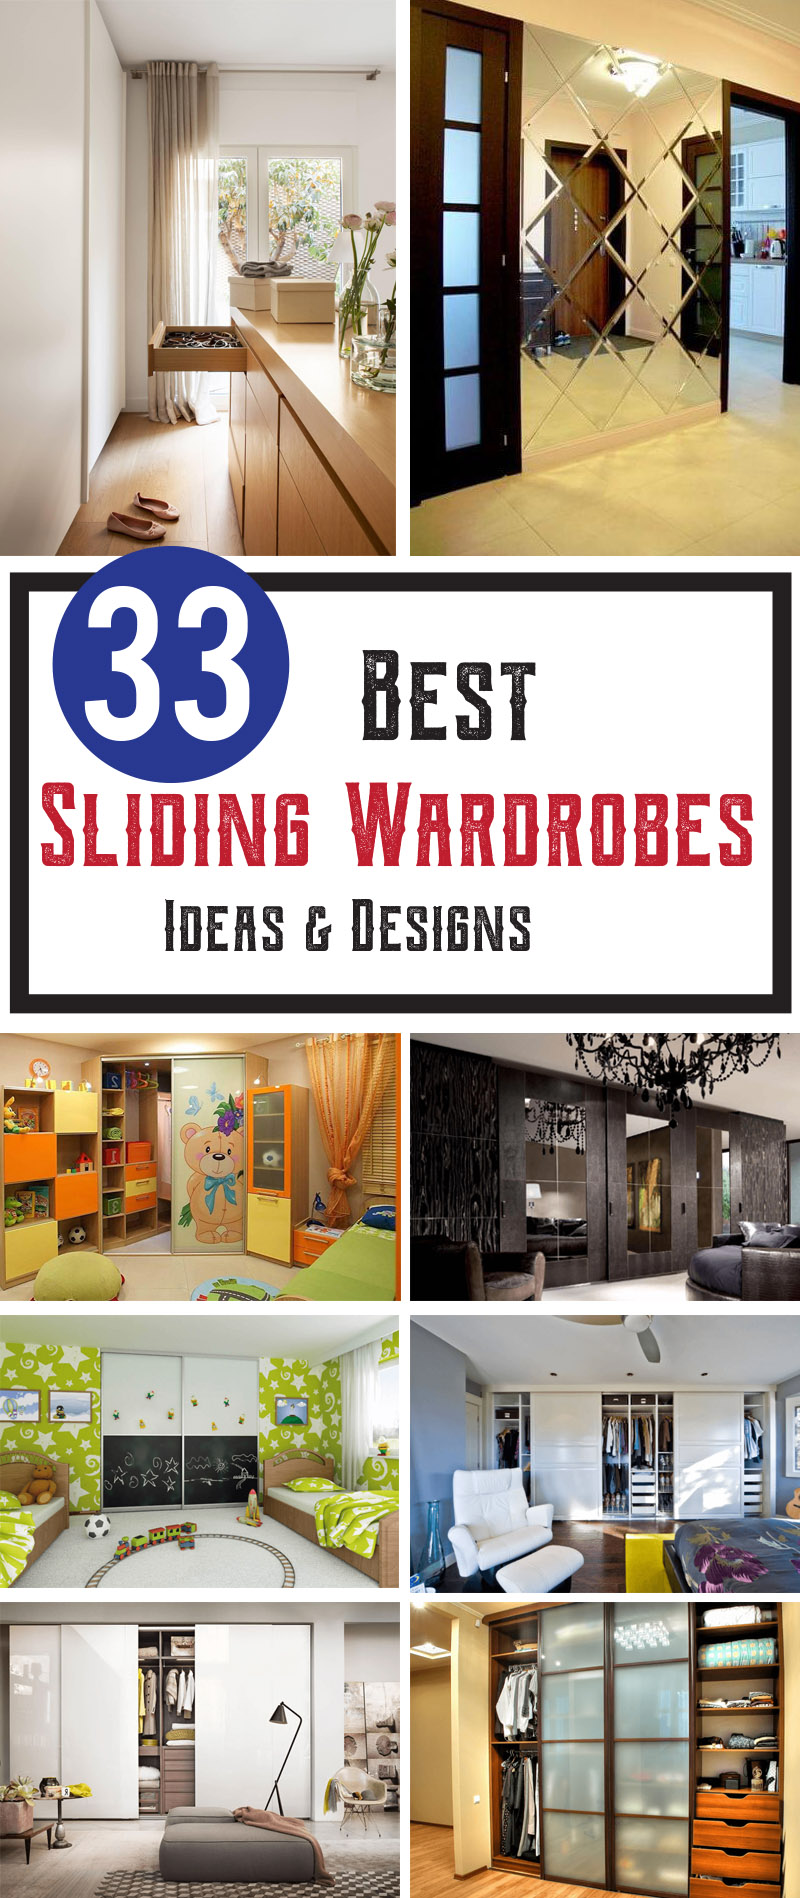 Best sliding wardrobes ideas and designs